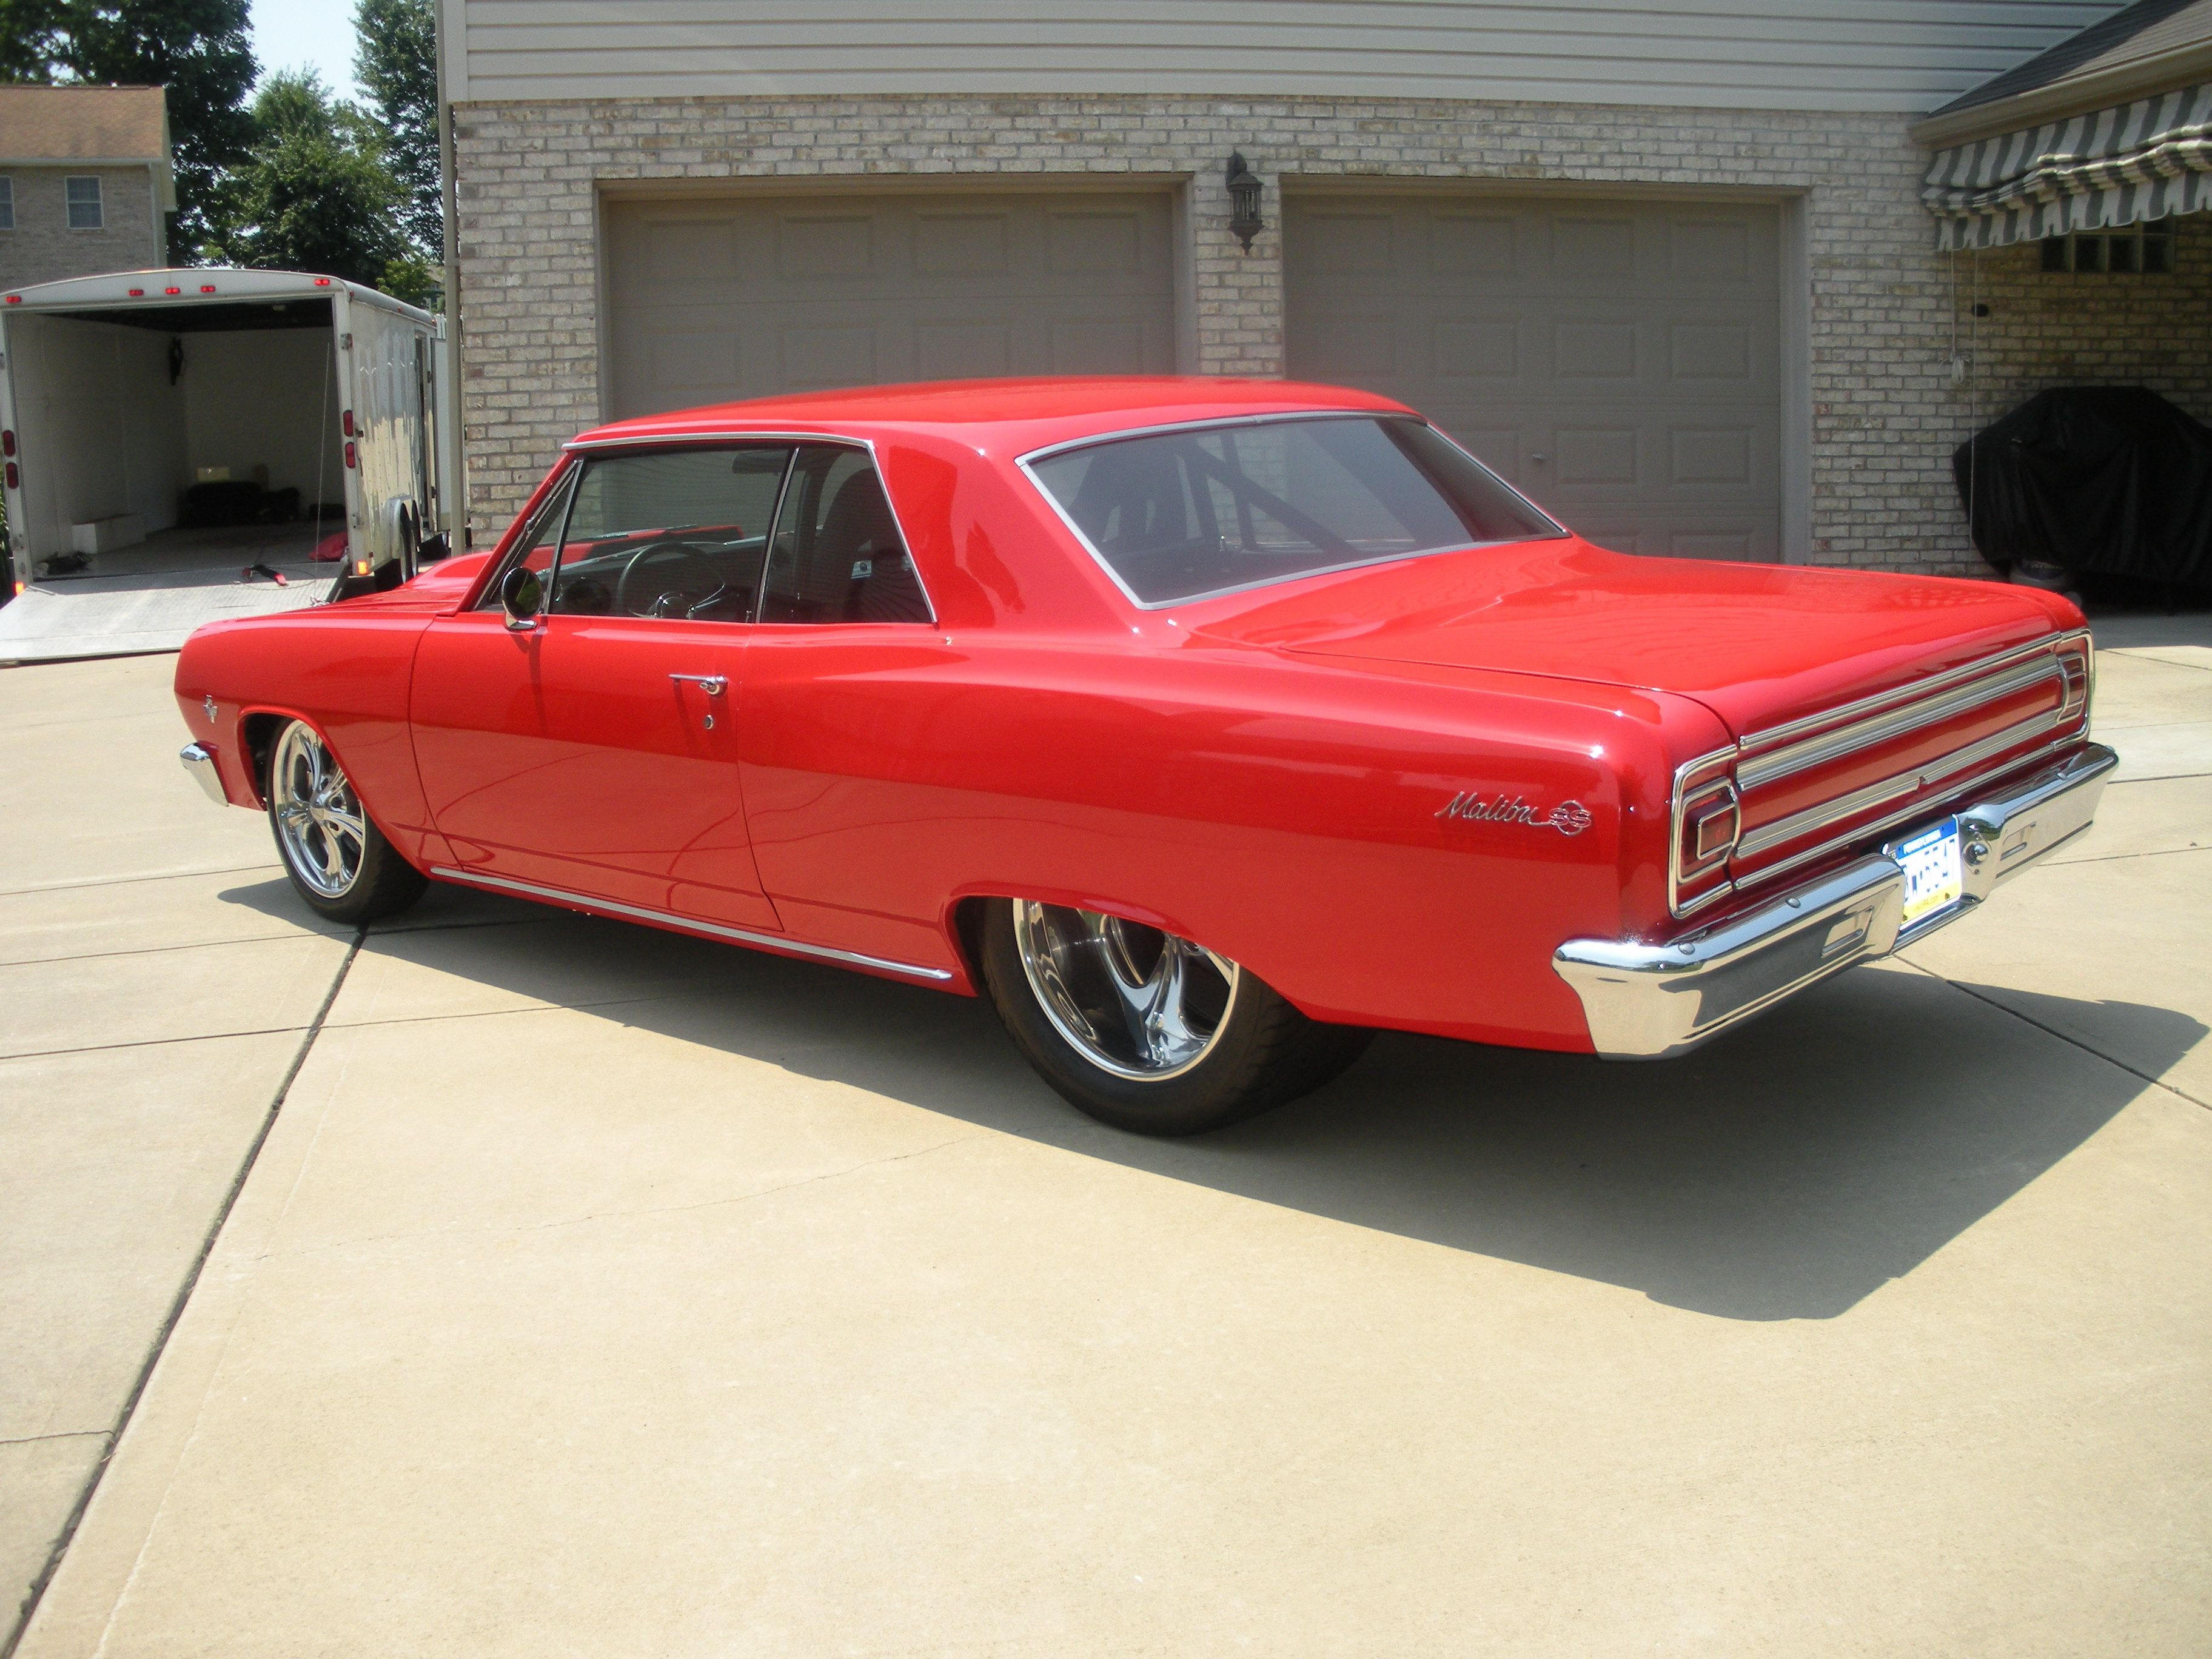 1965 Malibu Previous Next Cool Old Cars Malibu Chevrolet